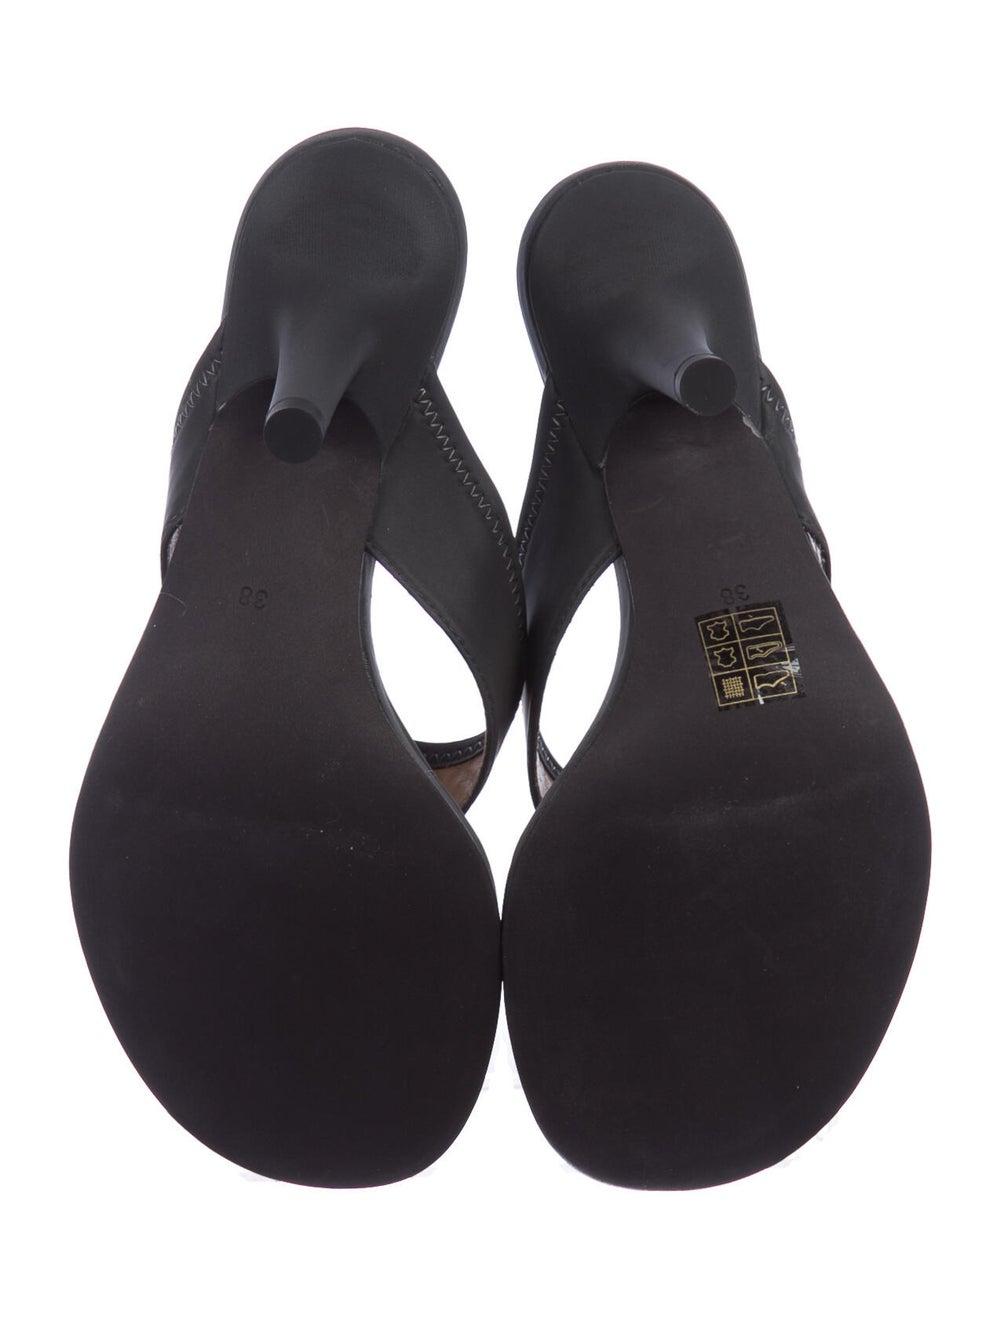 Yeezy T-Strap Sandals Grey - image 5